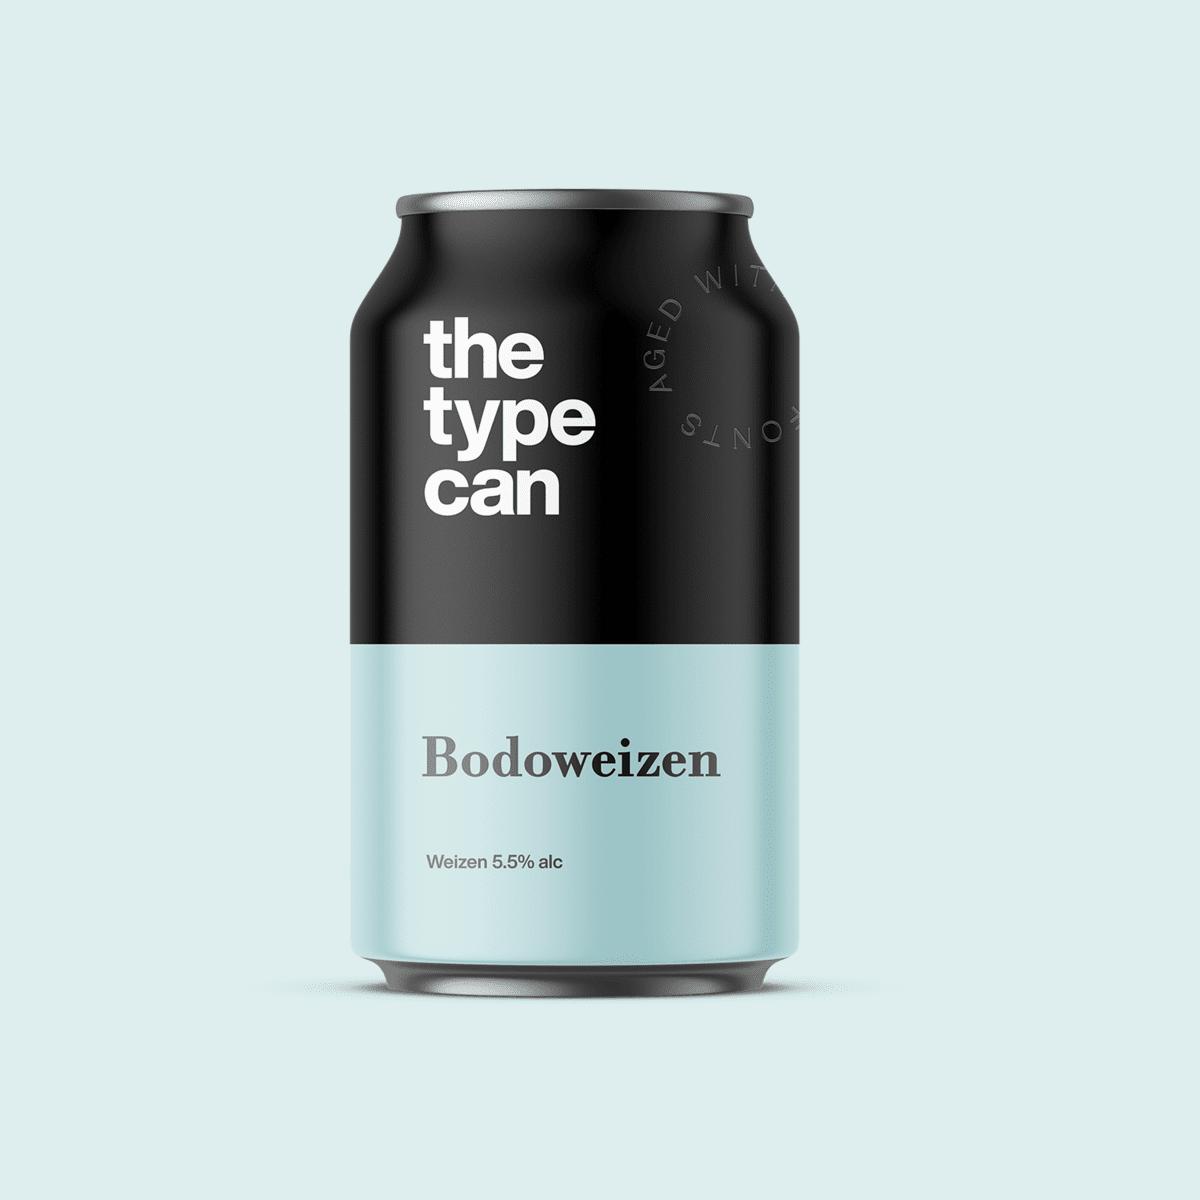 Thetypecan 2 - Obal piva pro milovníky typografie